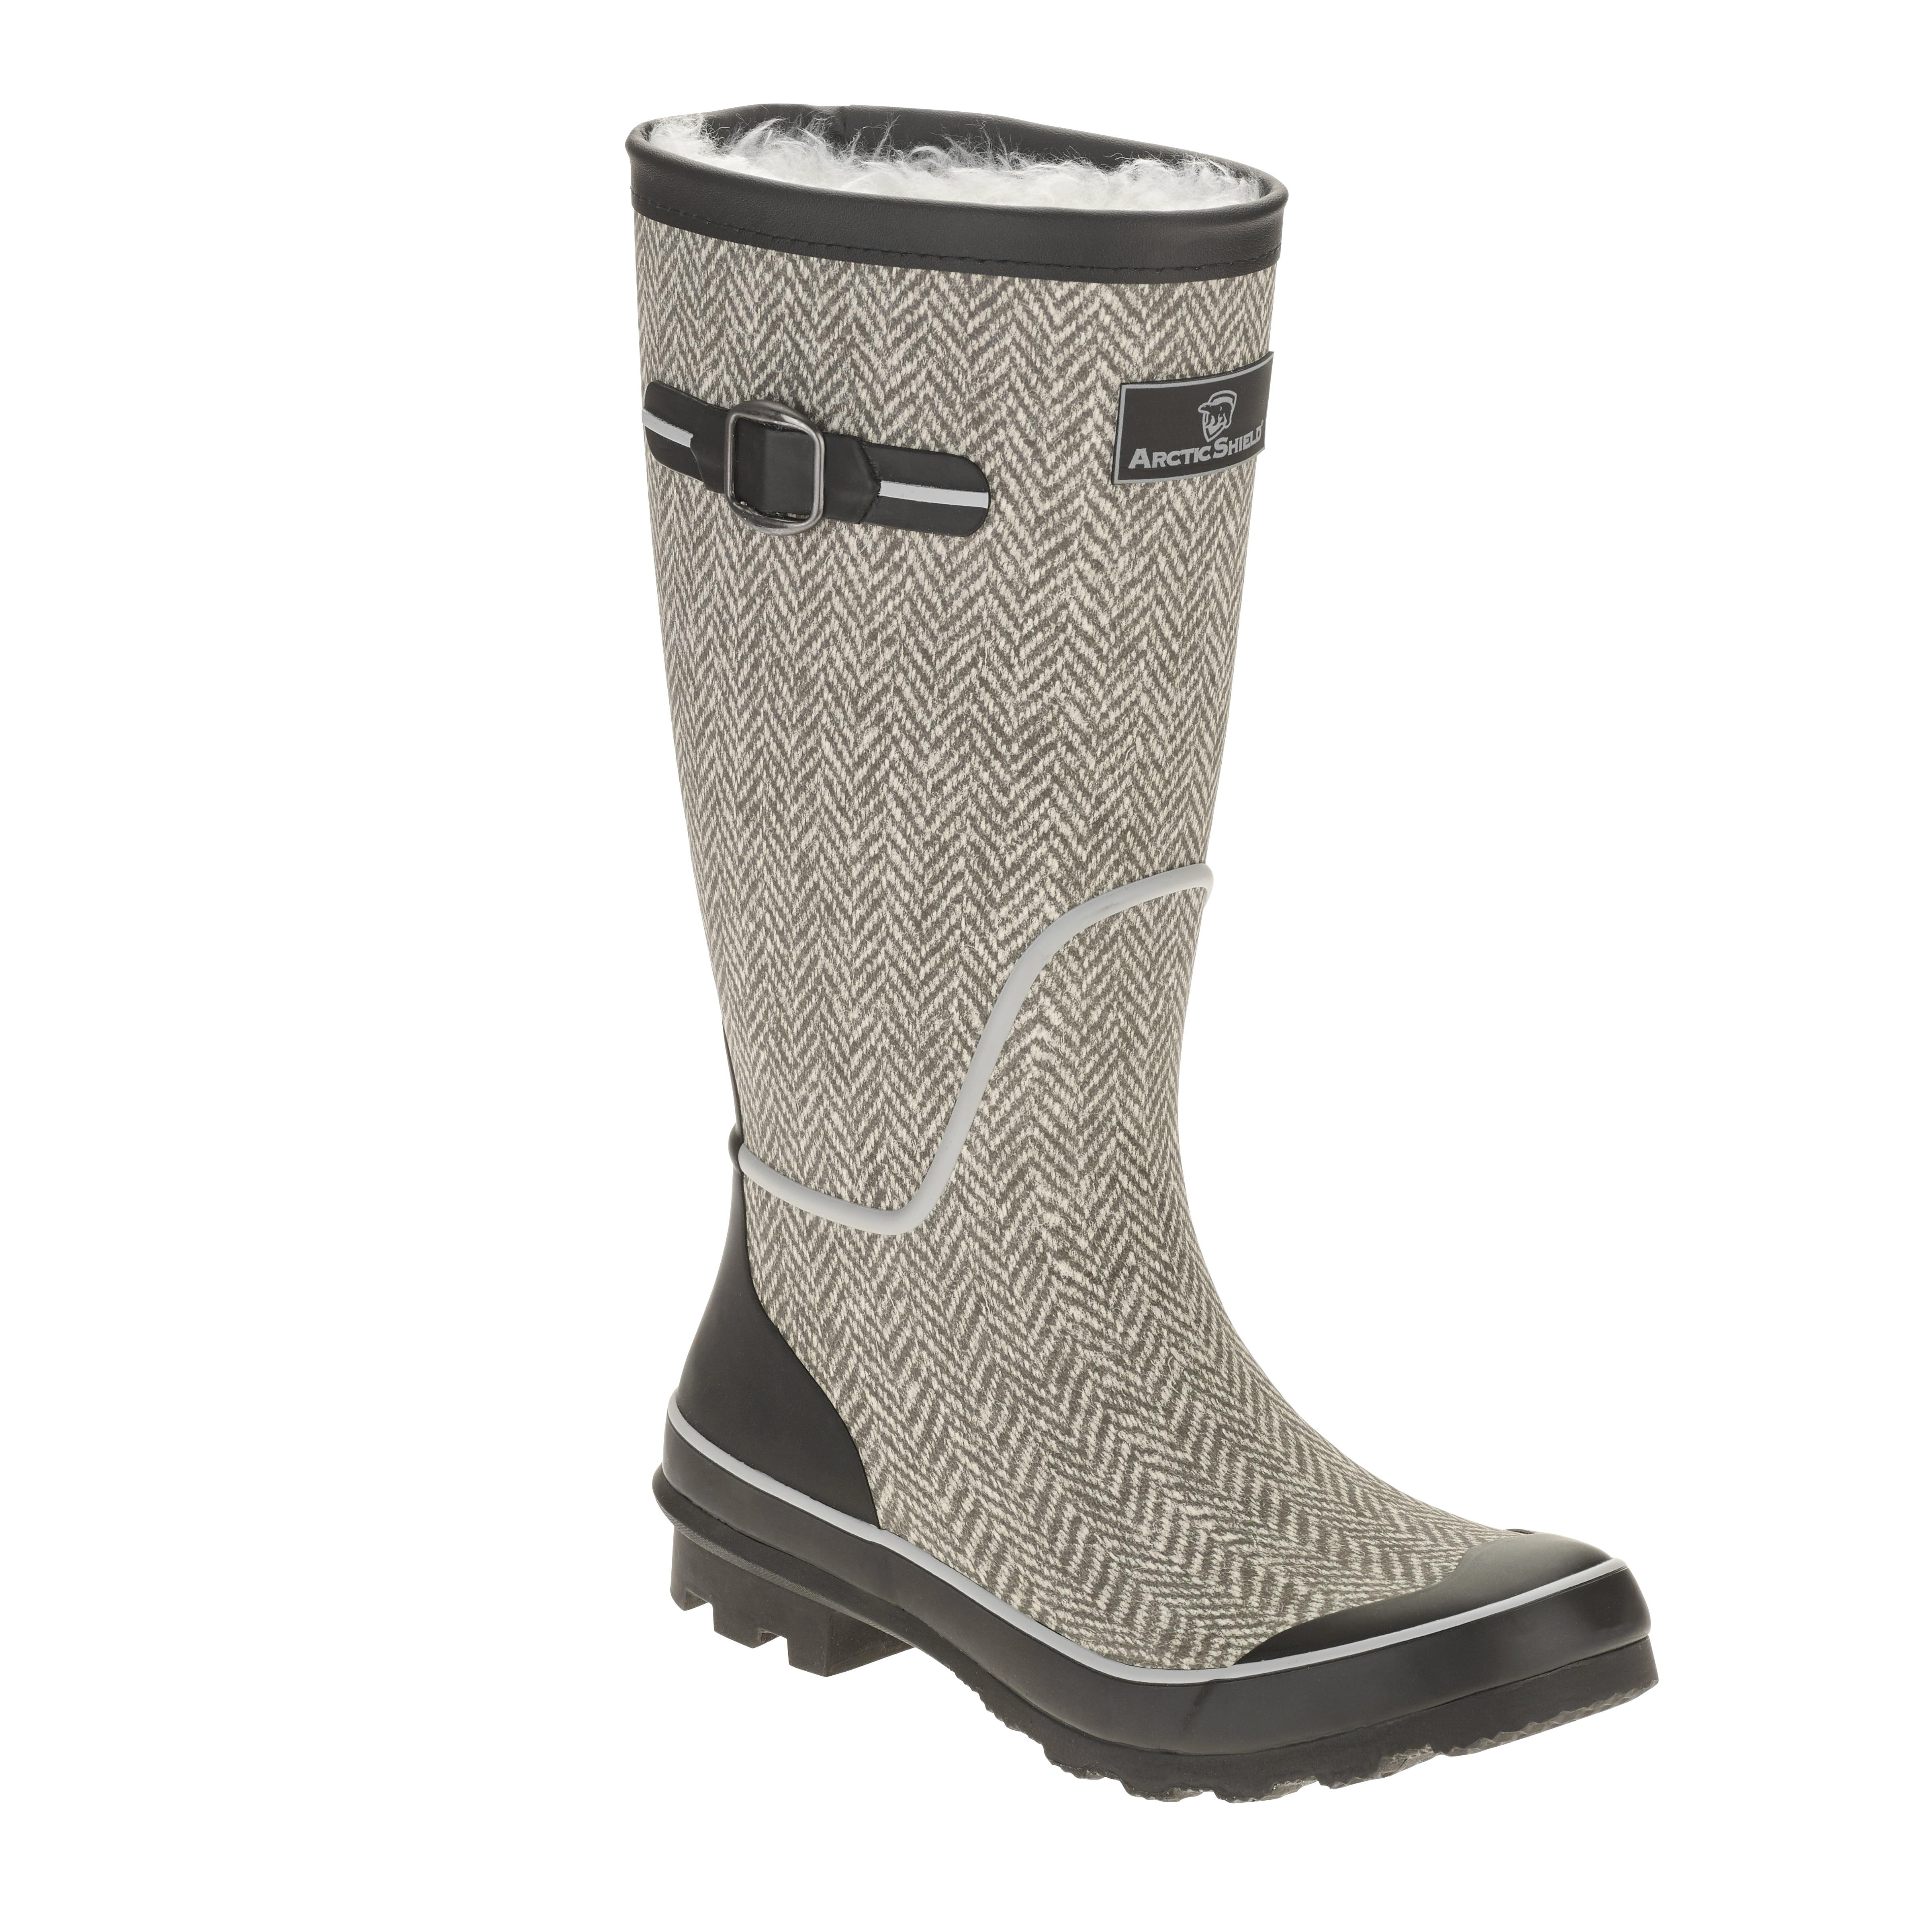 arctic shield s rubber winter boot walmart